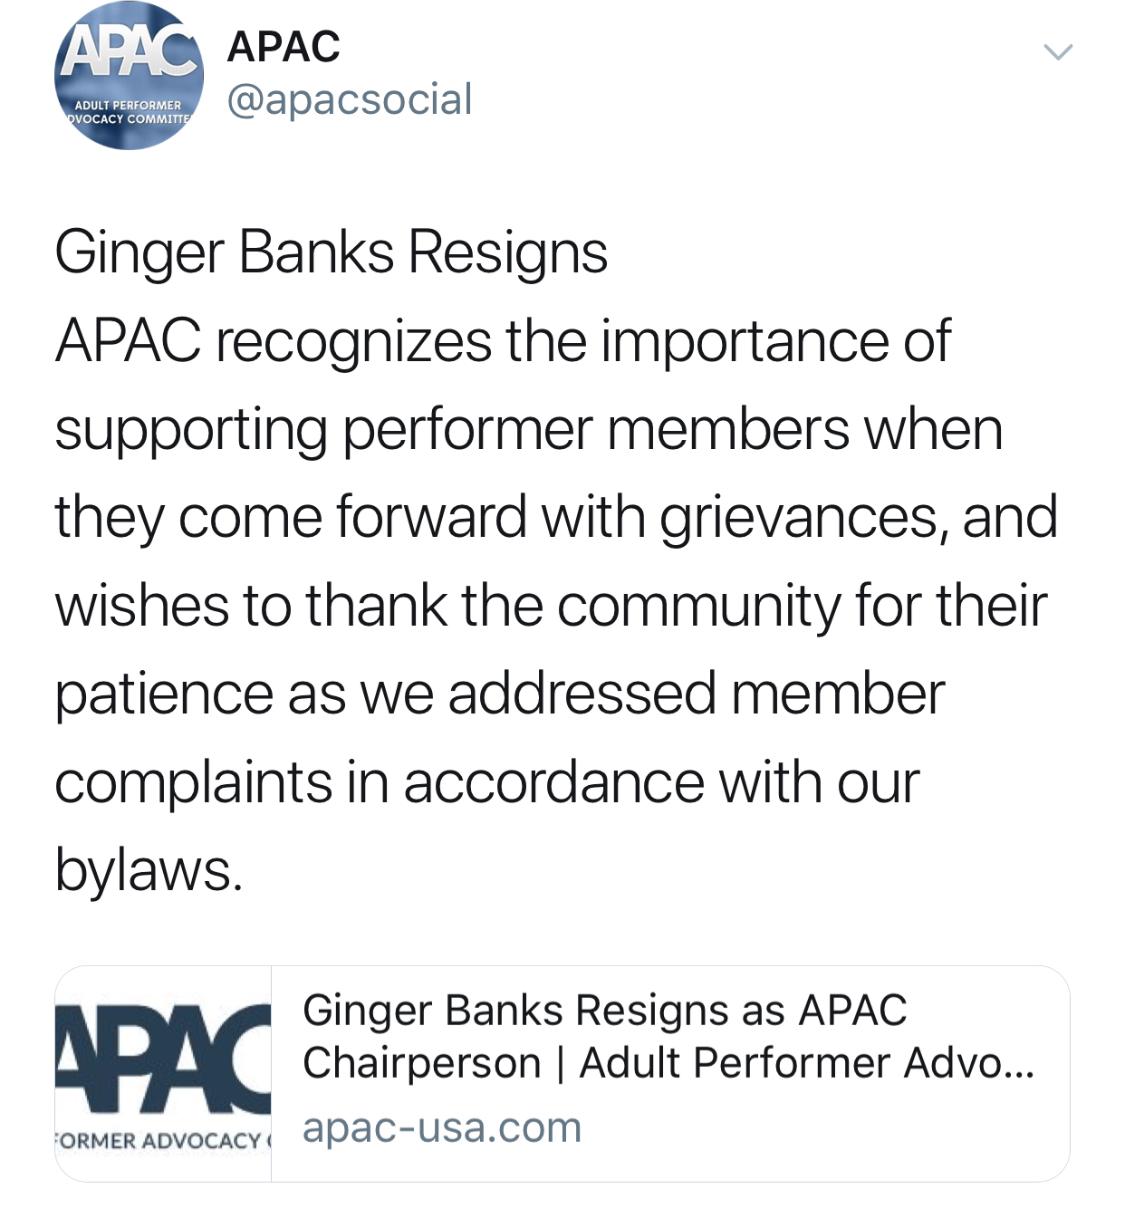 Ginger Banks